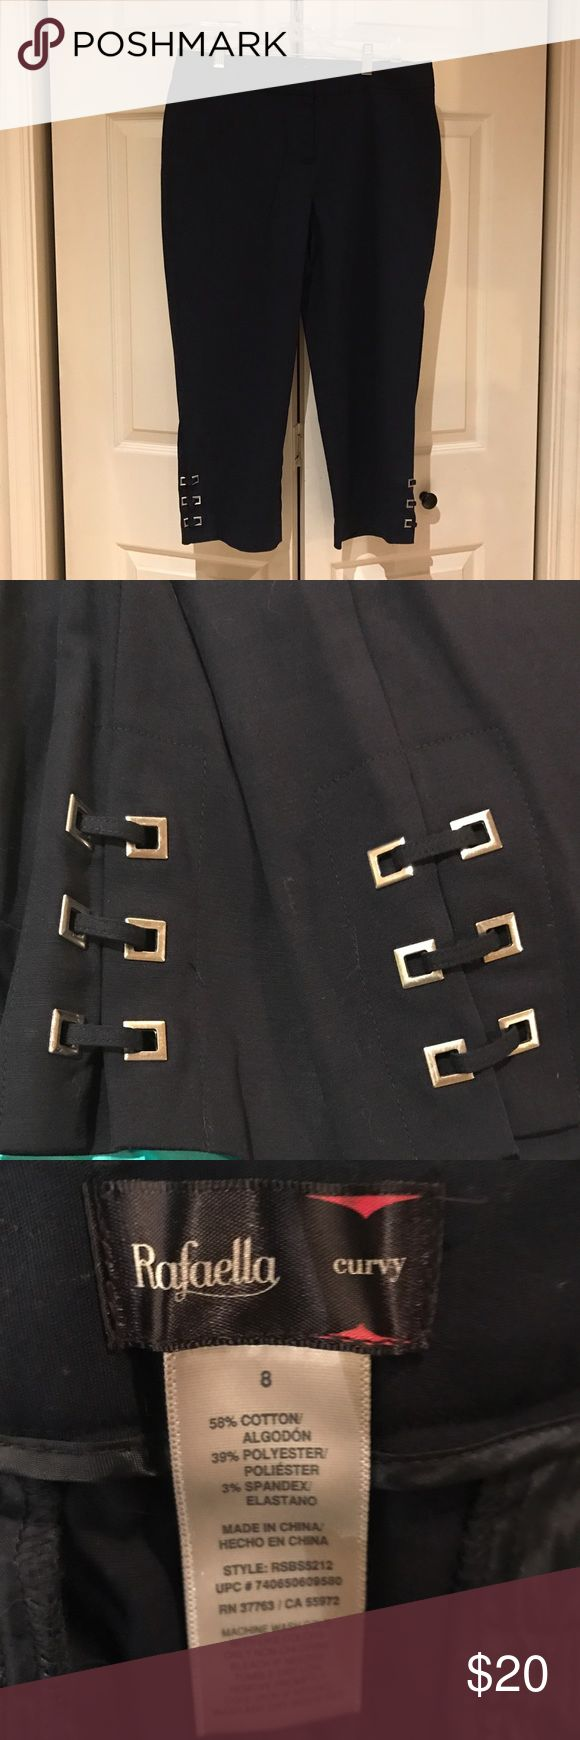 Rafaella capris with detailing Women's navy capris with metal detailing at bottom Rafaella Pants Capris